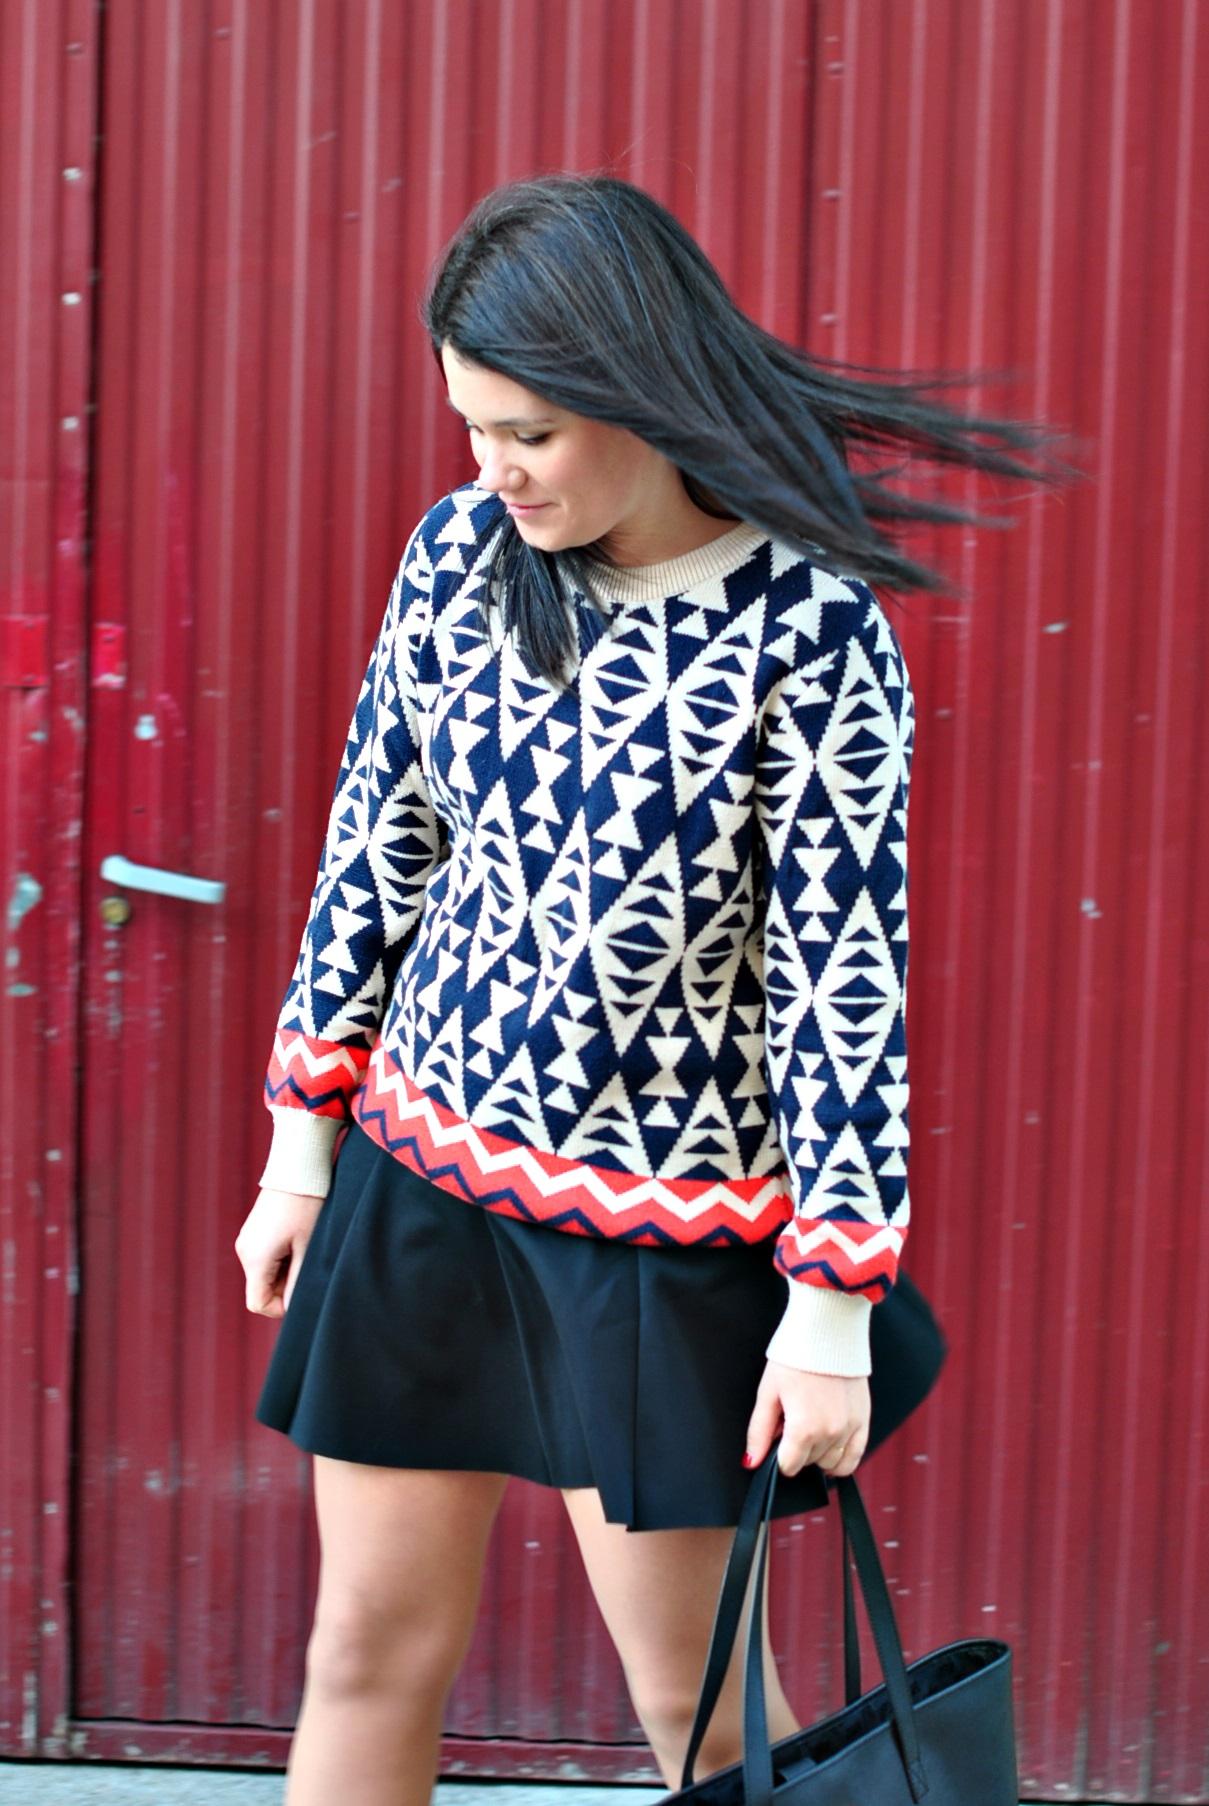 20151202-pepaloves-sweater-11